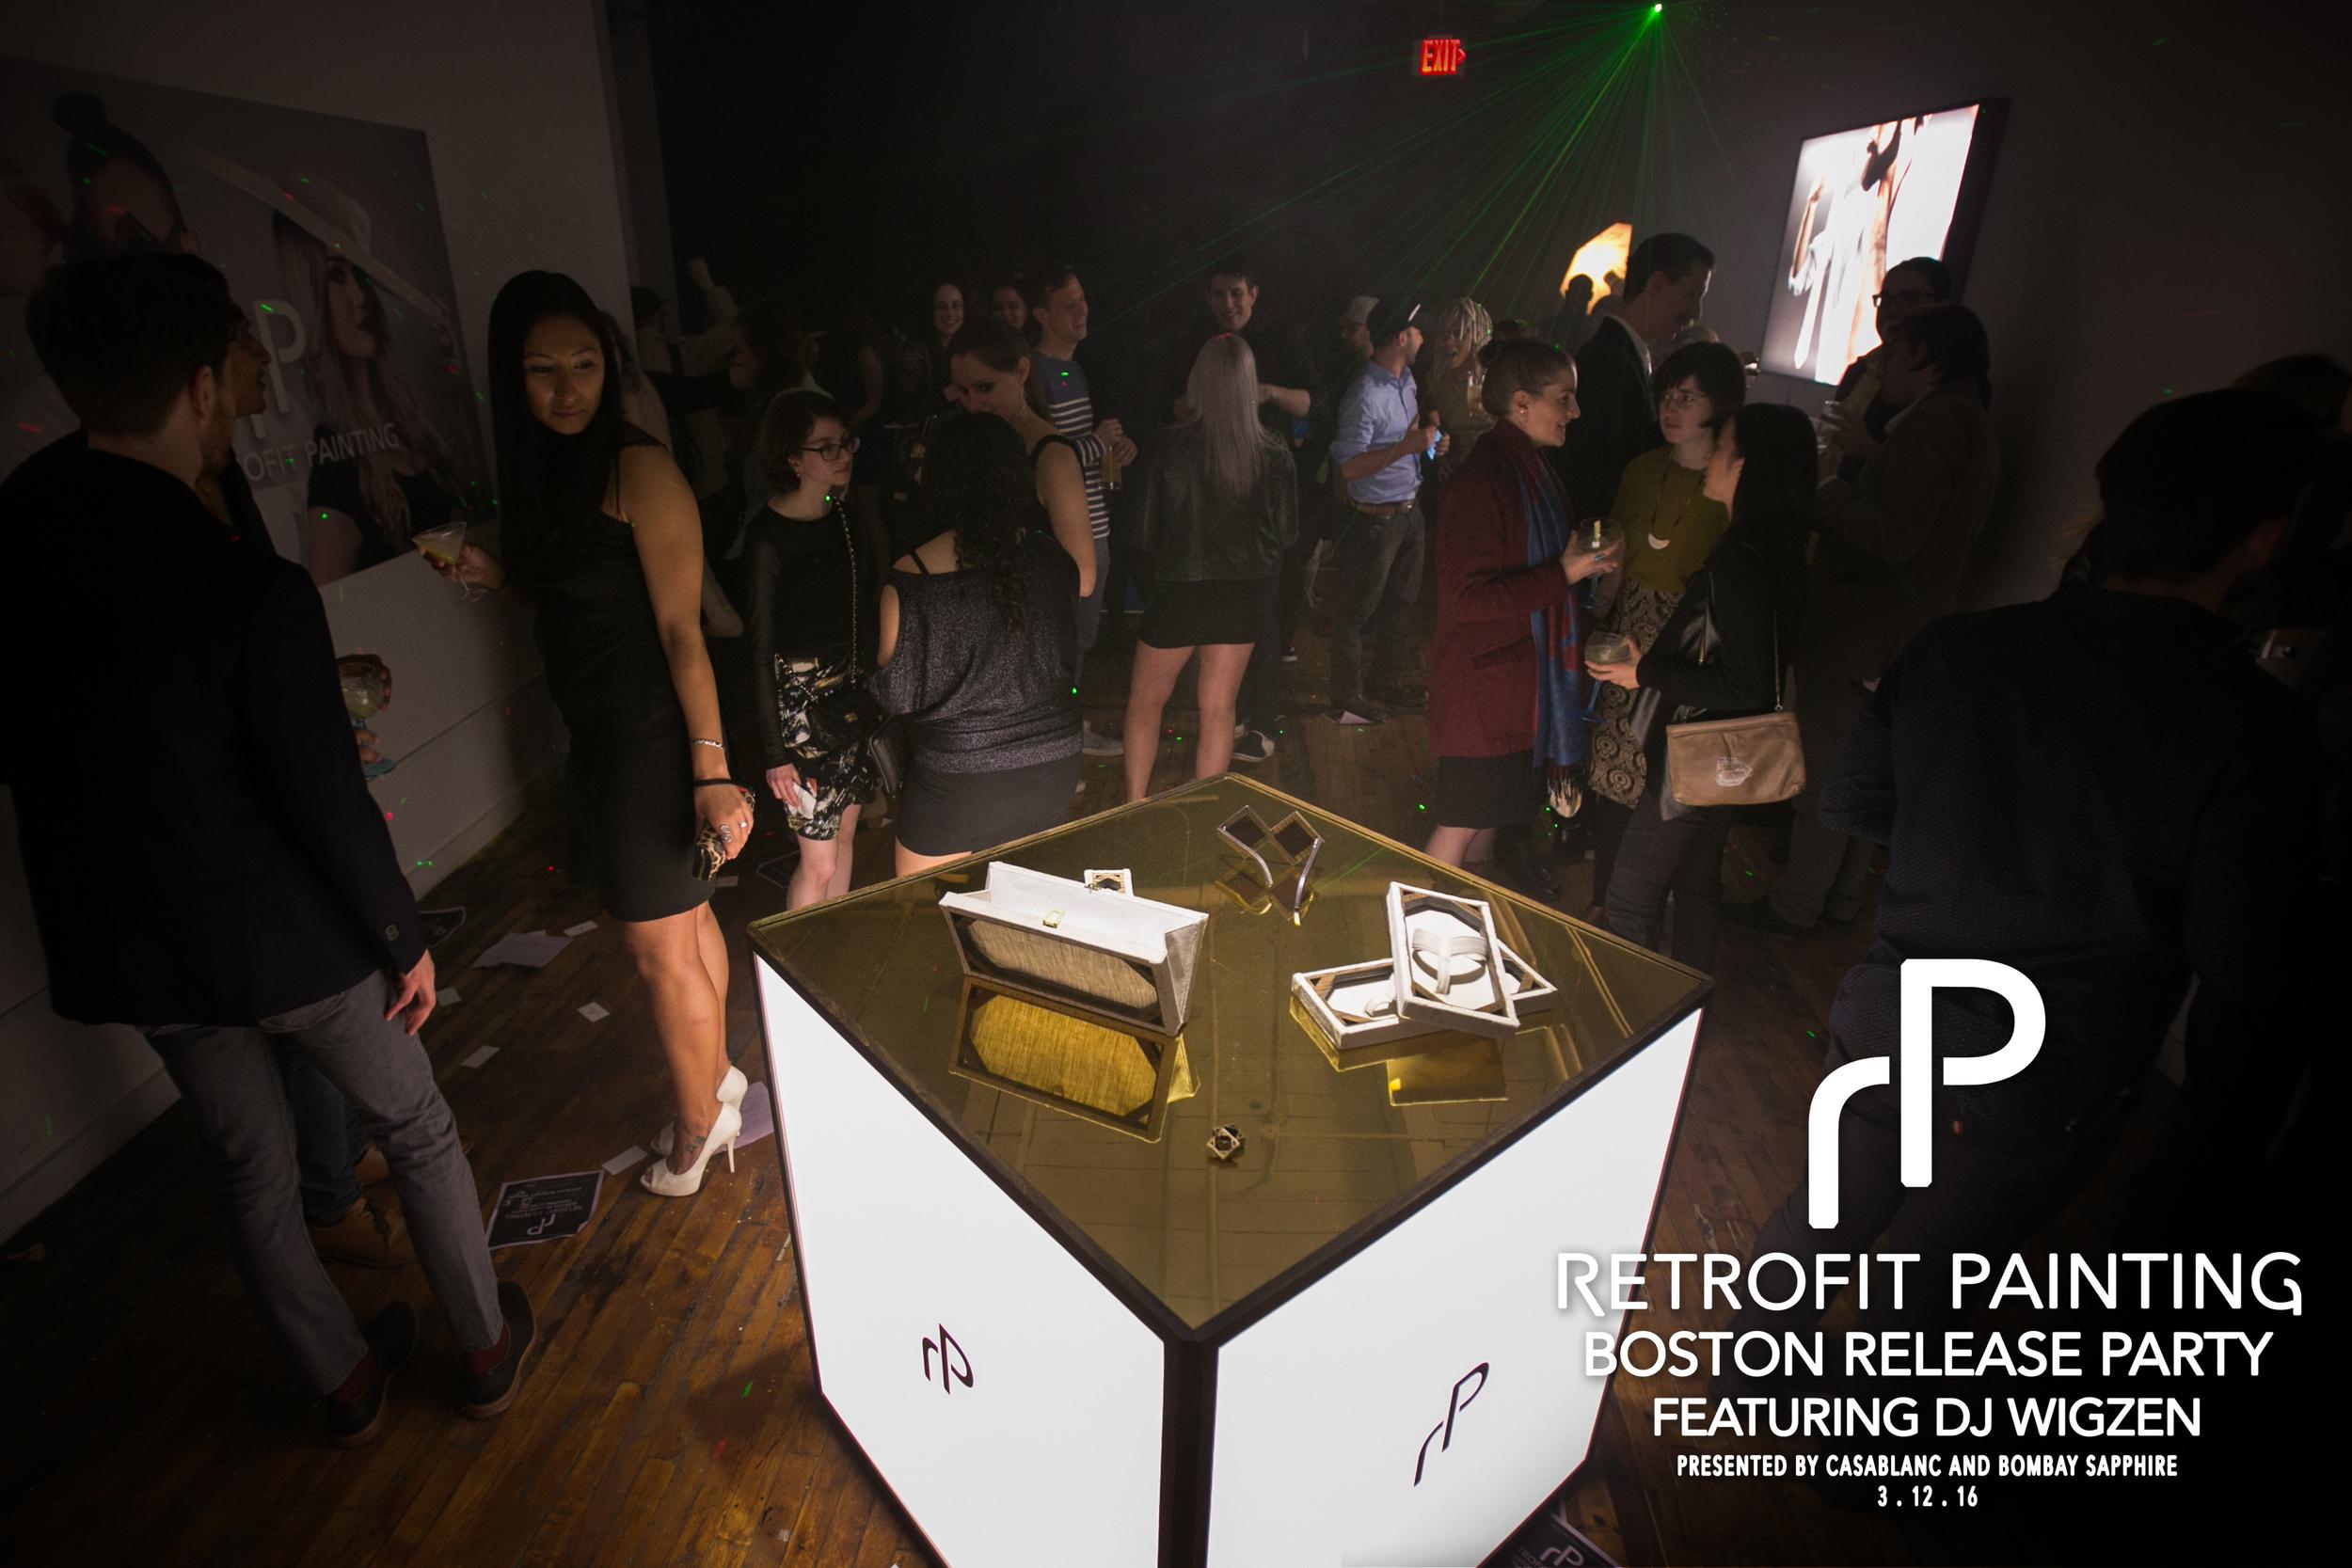 Retrofit Painting Boston Release Party 0204.jpg